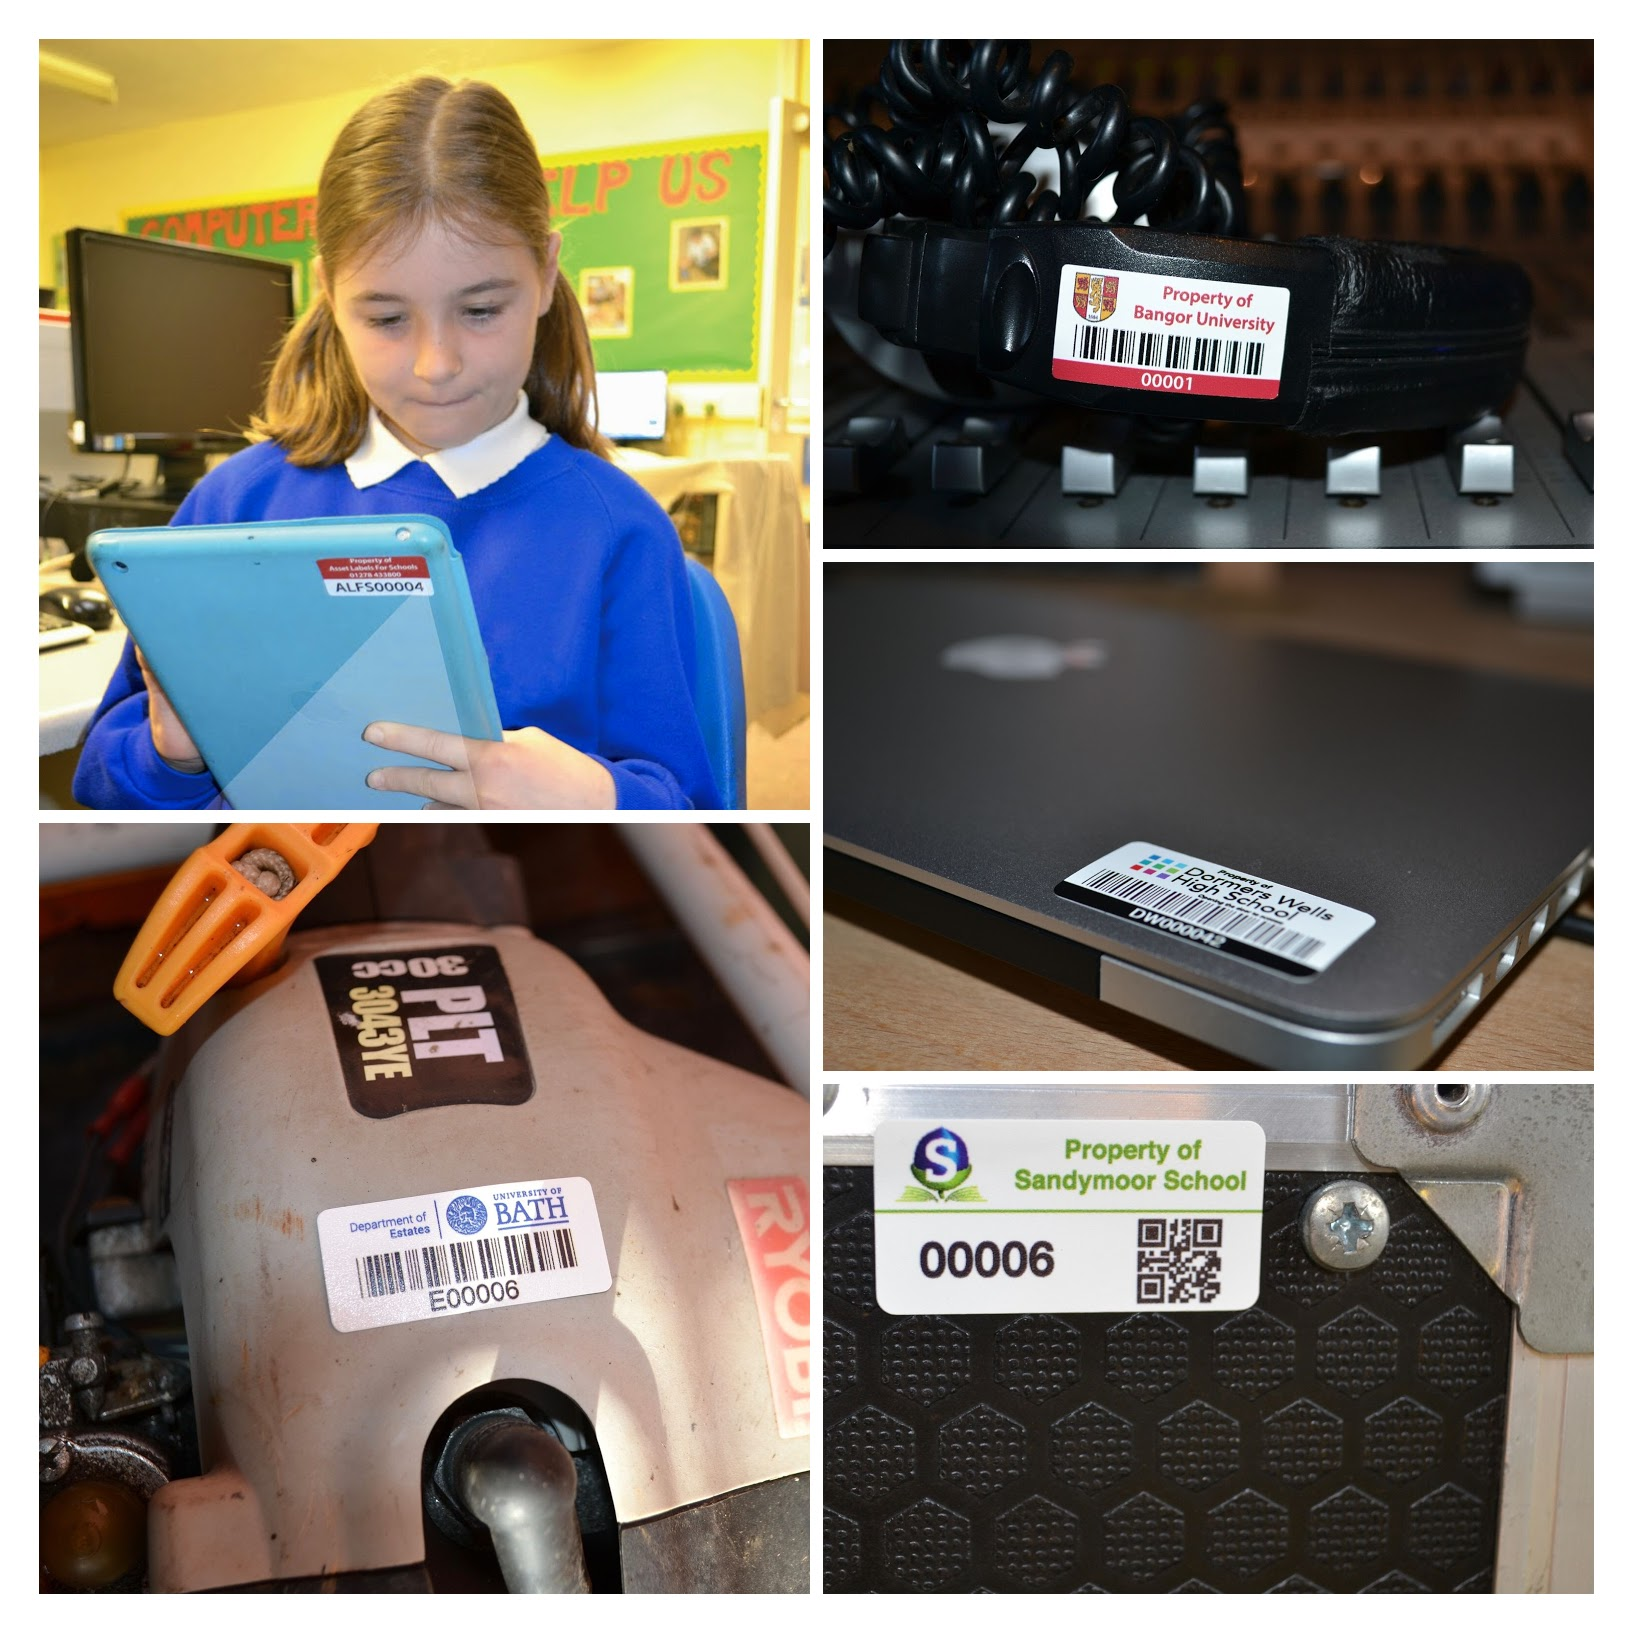 School Asset Labels